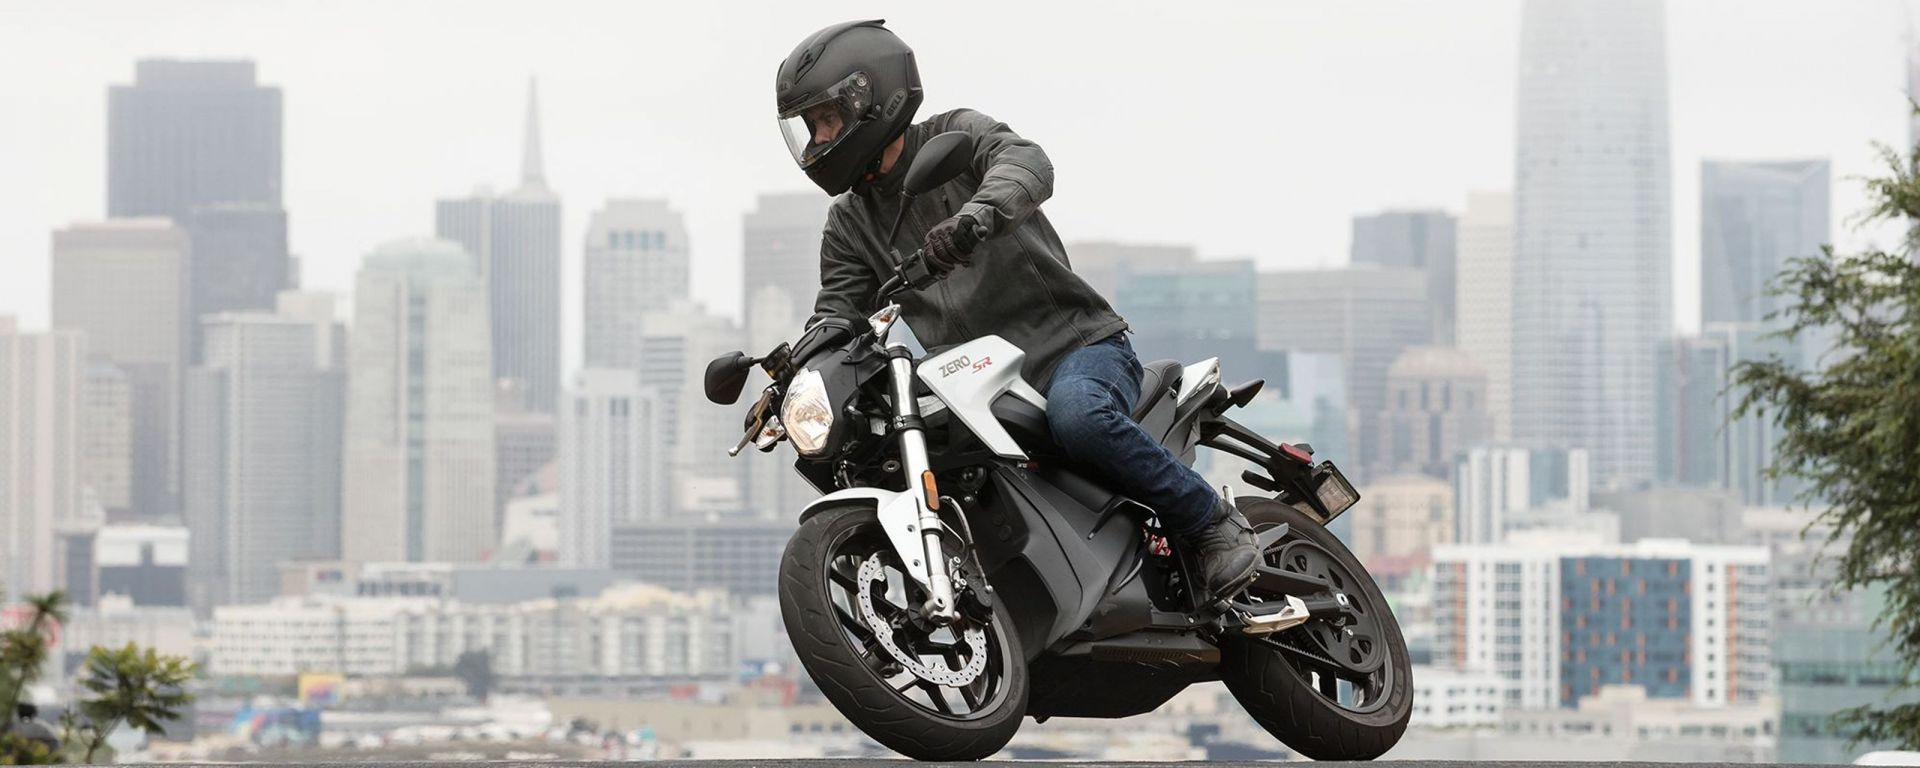 La Zero SR di Zero Motorcycles